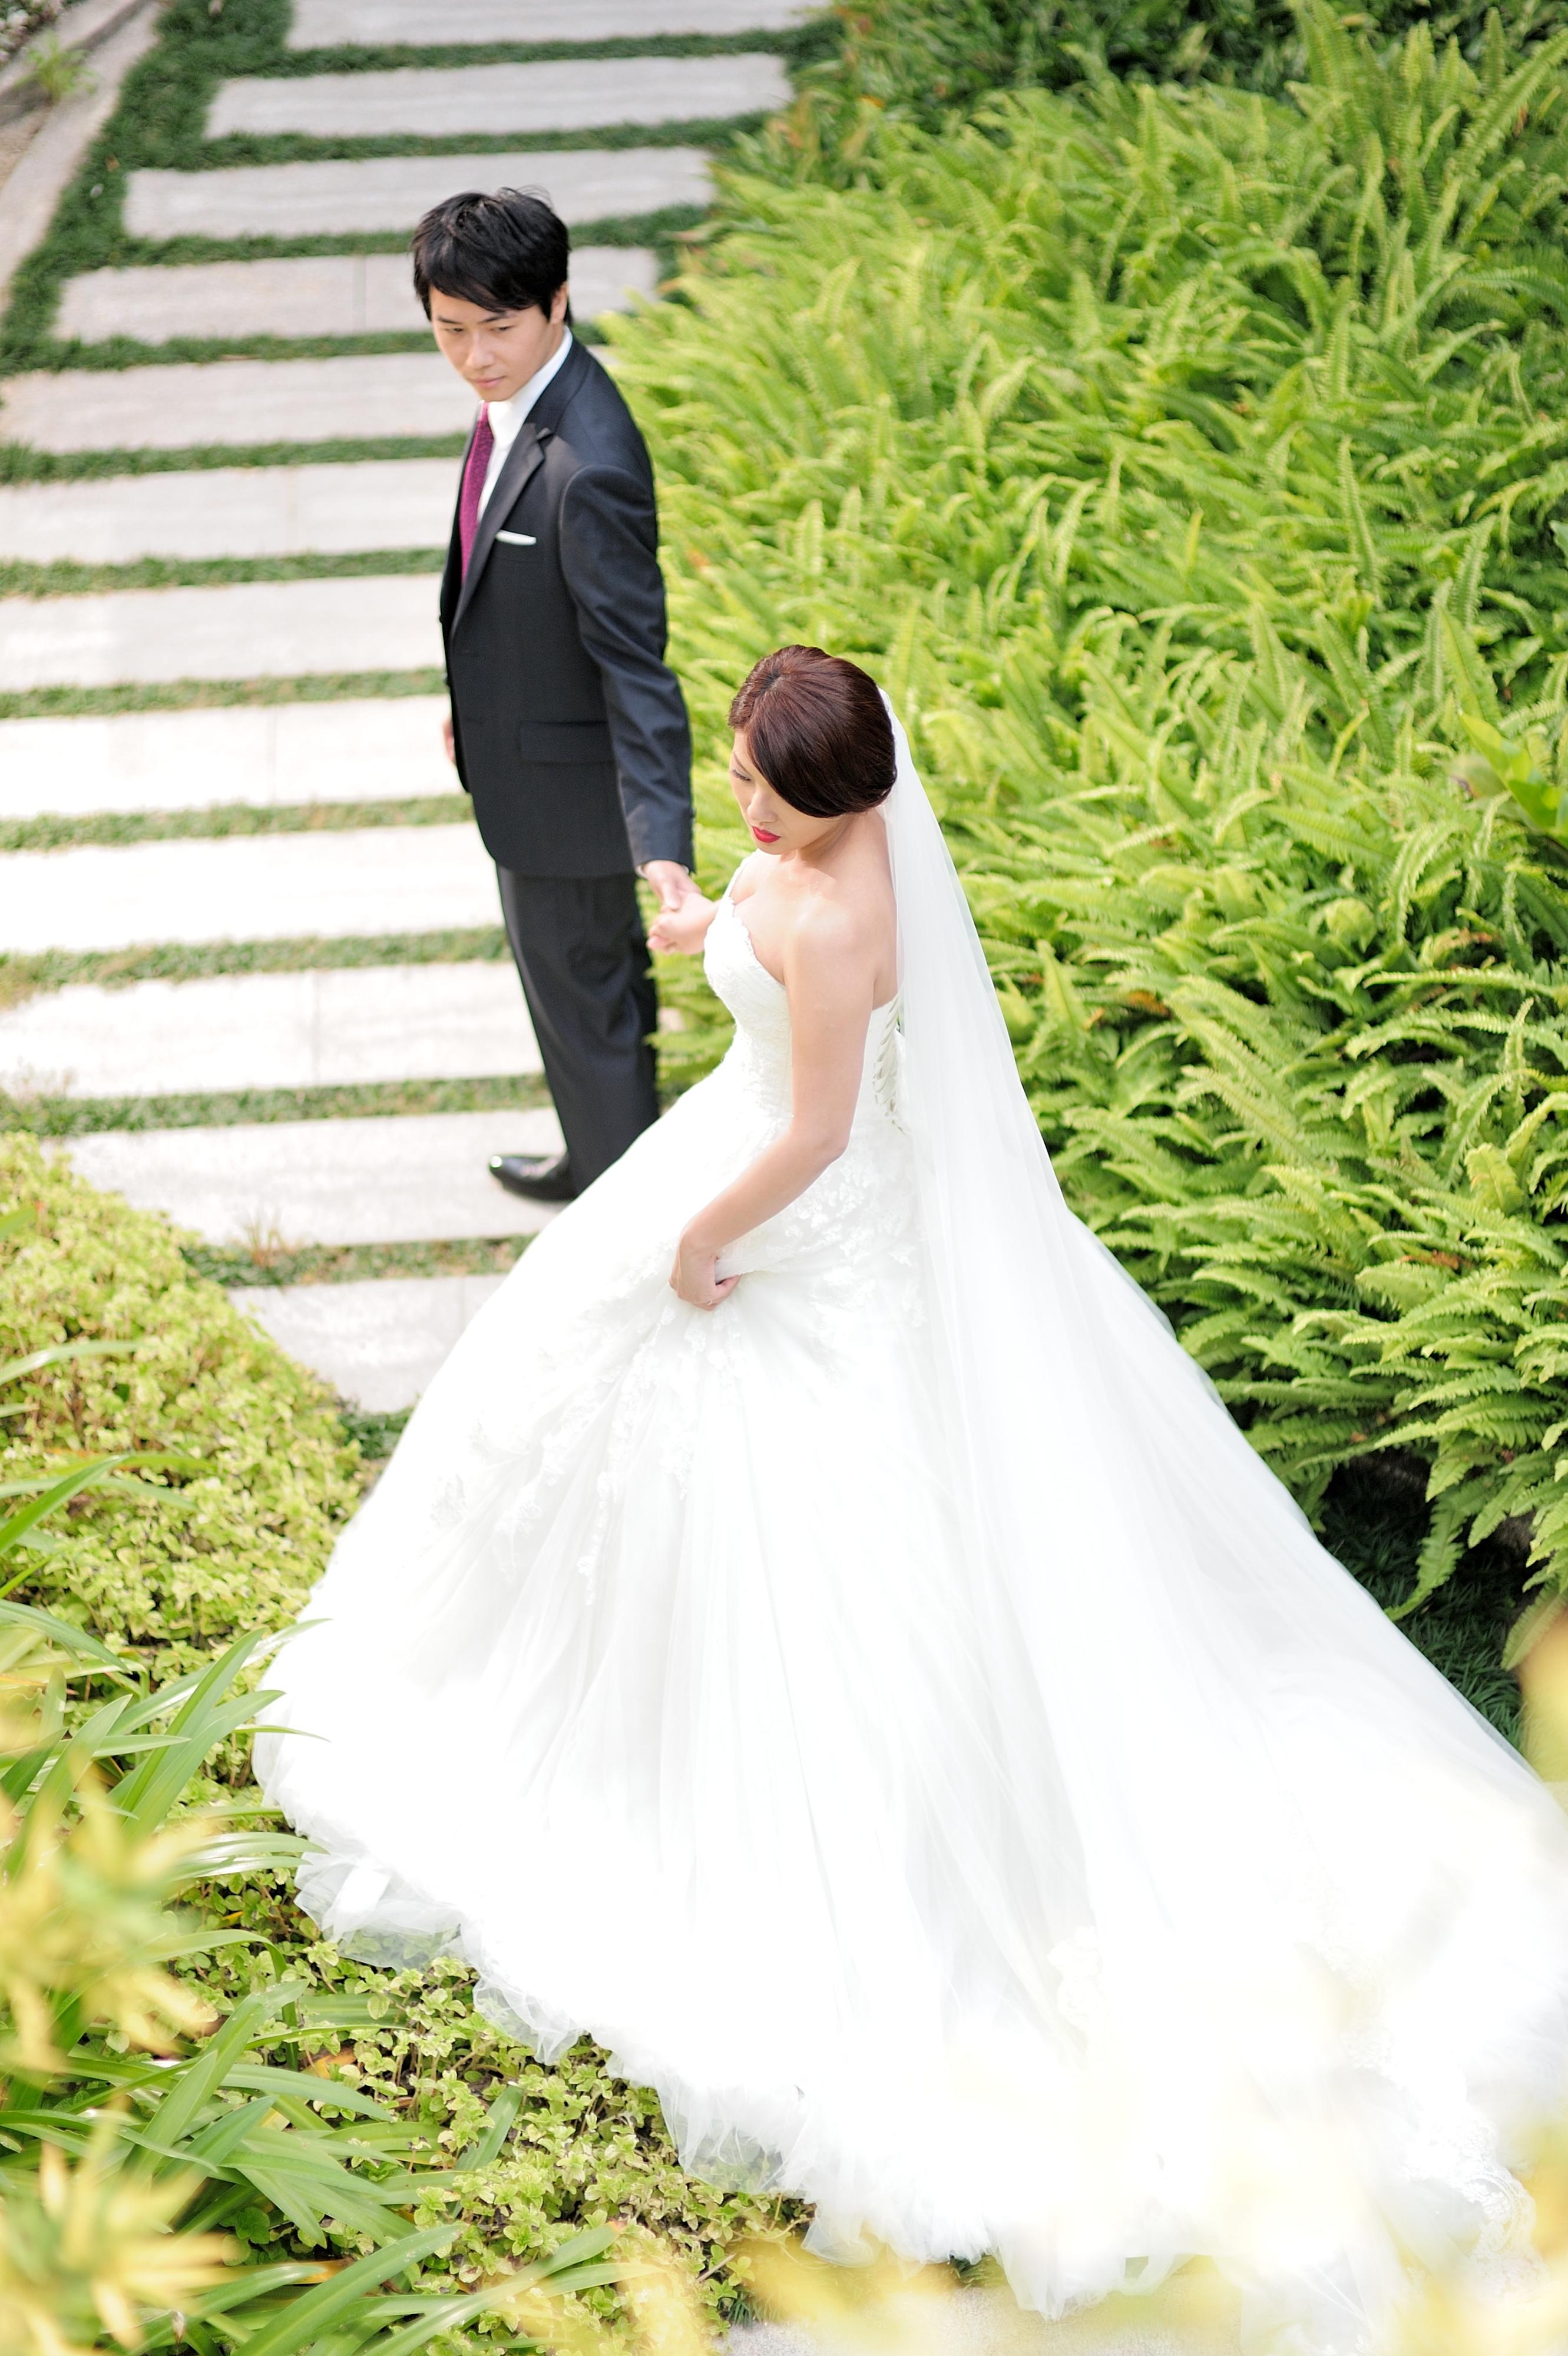 bride-琇紜  婚攝/蔡艾迪